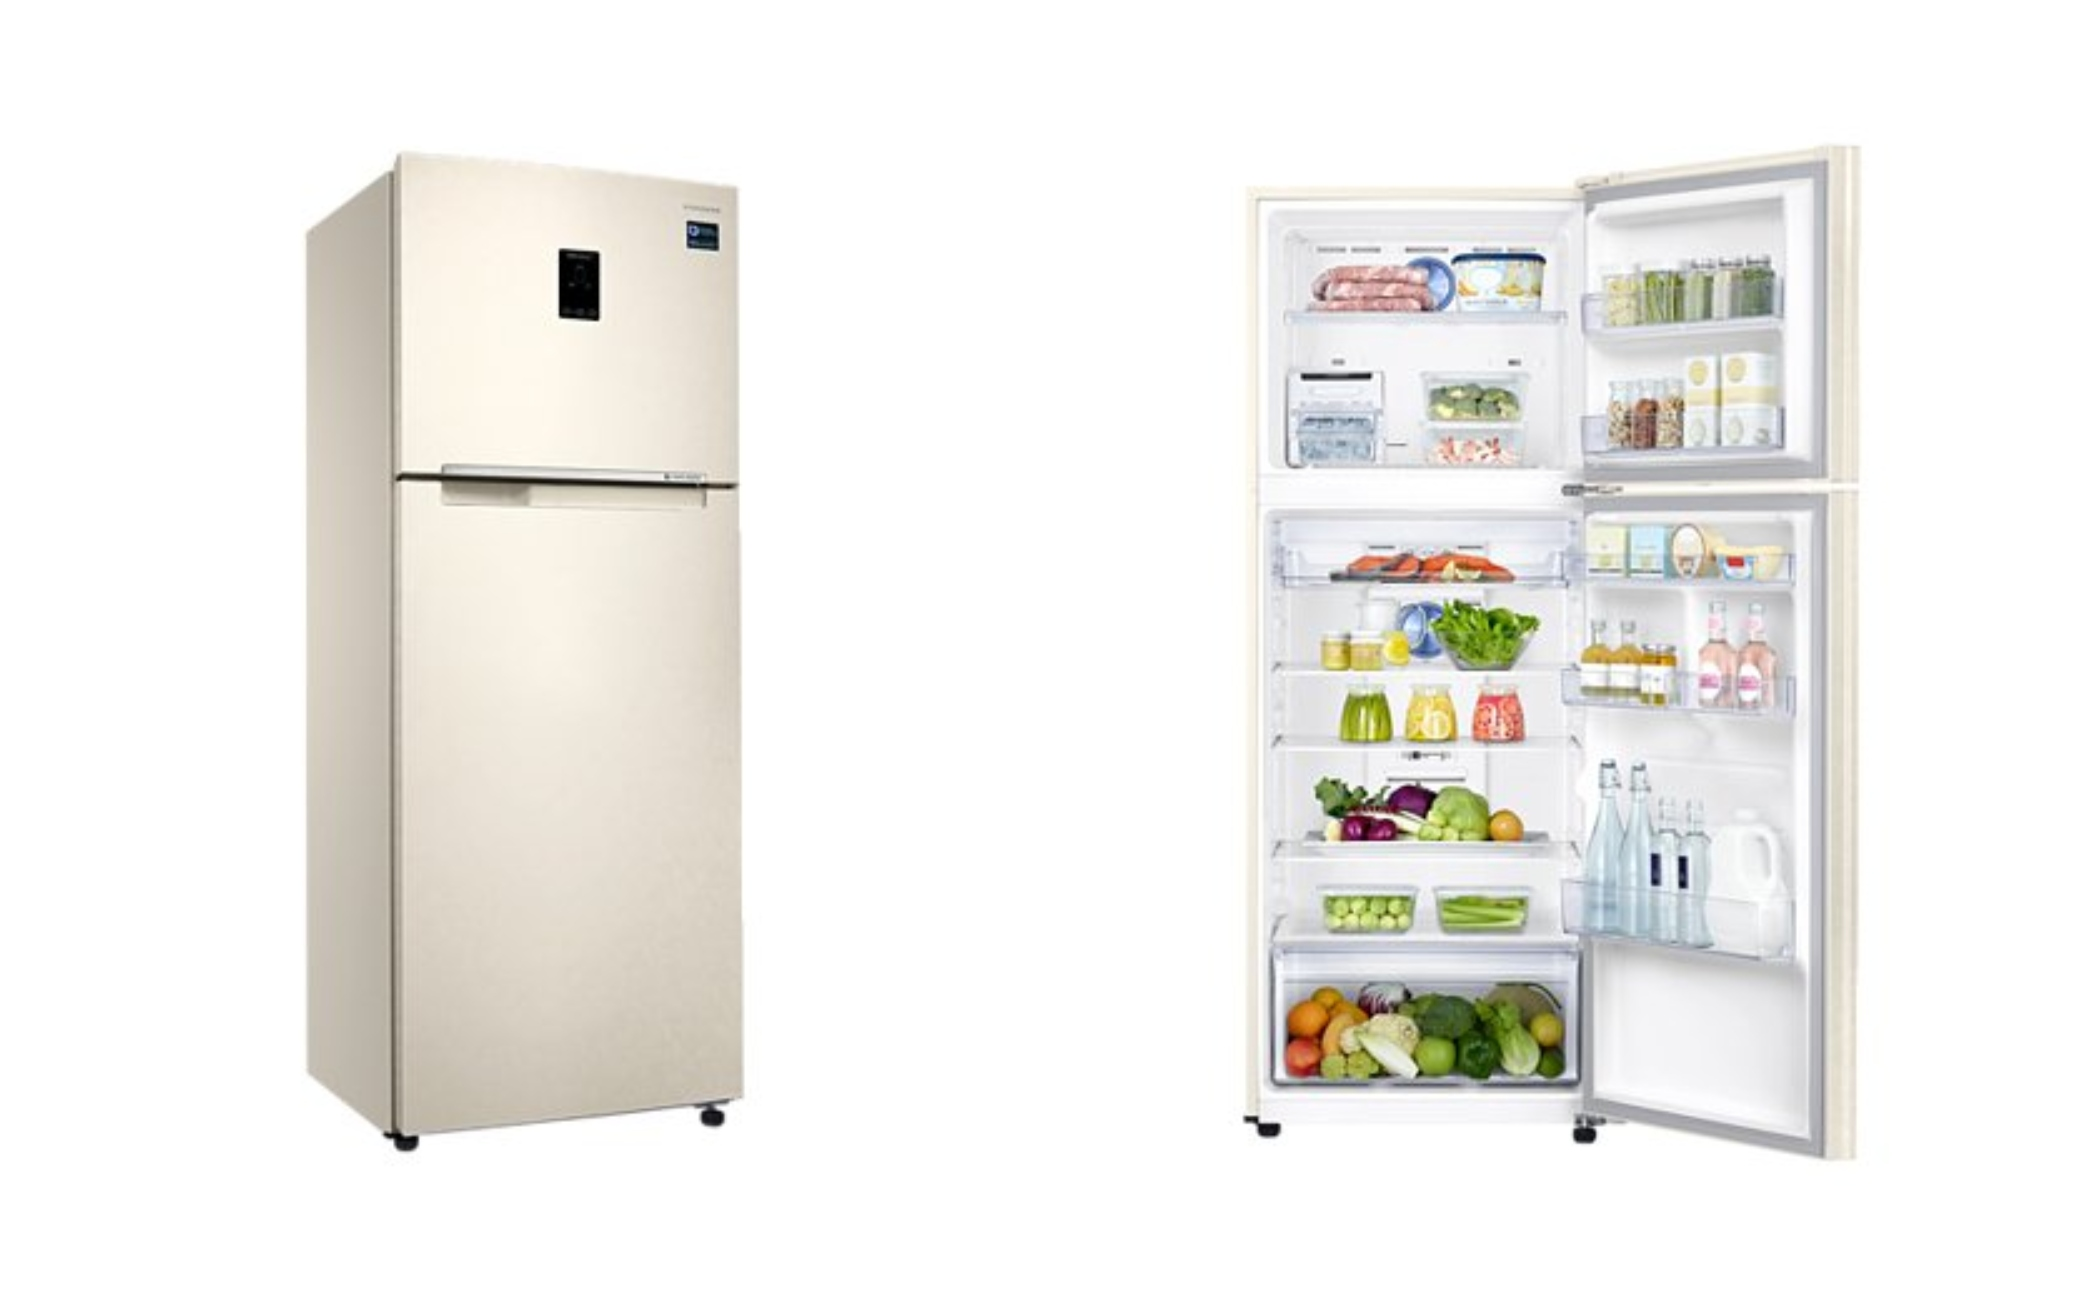 Samsung Frigorifero Smart Cooling